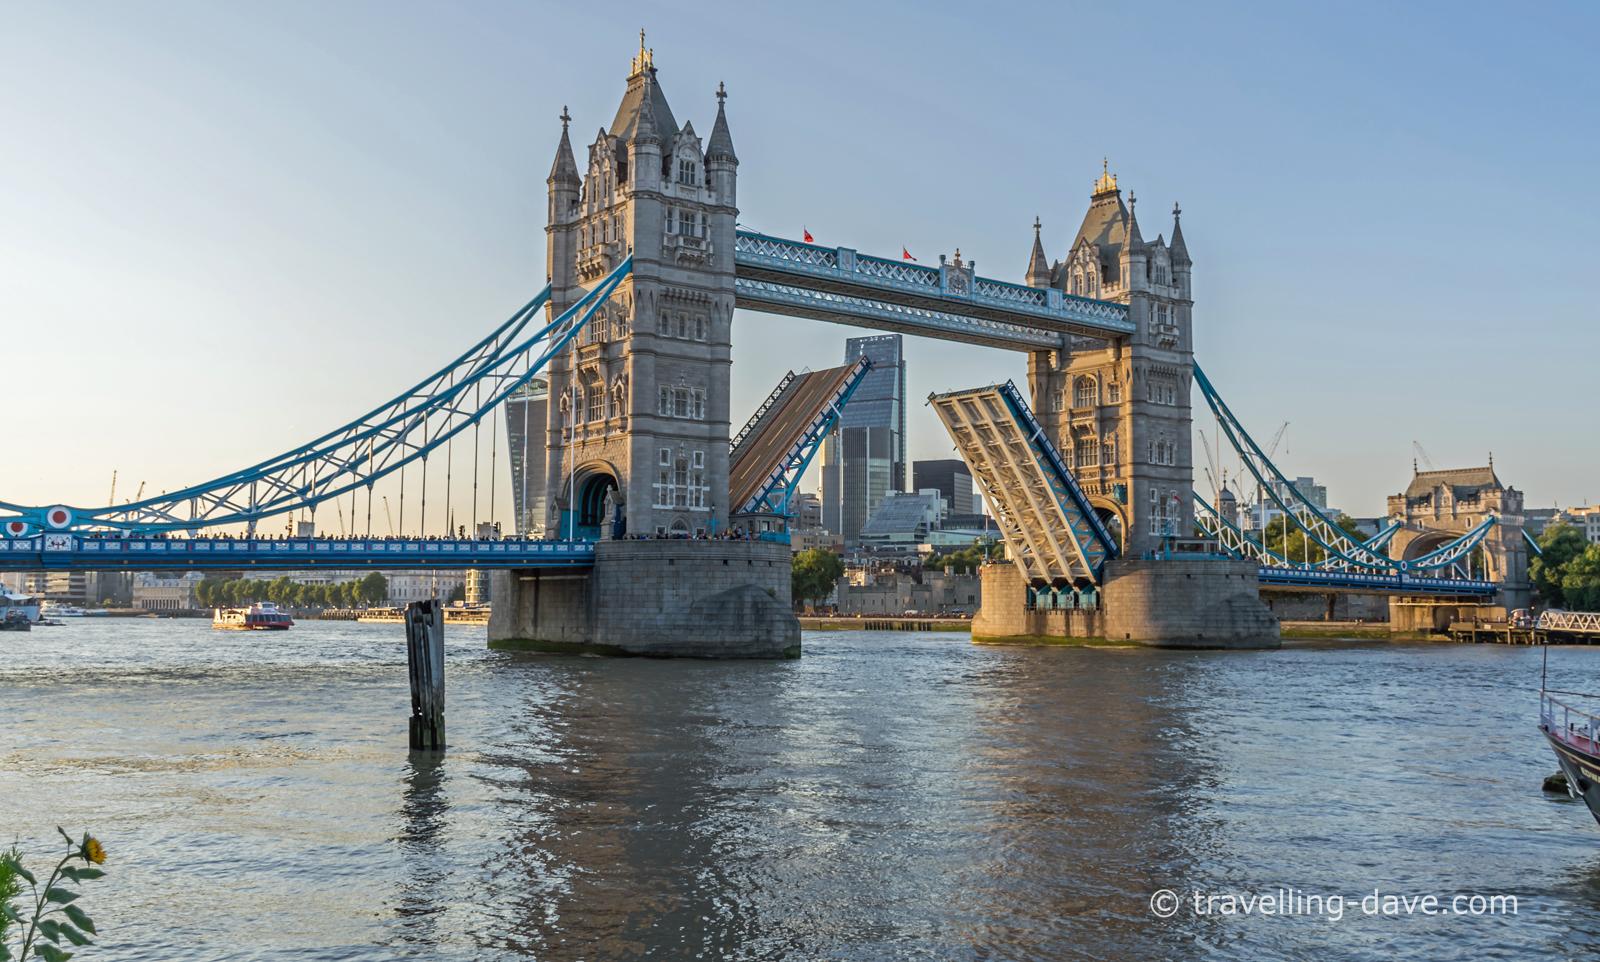 Tower Bridge opening